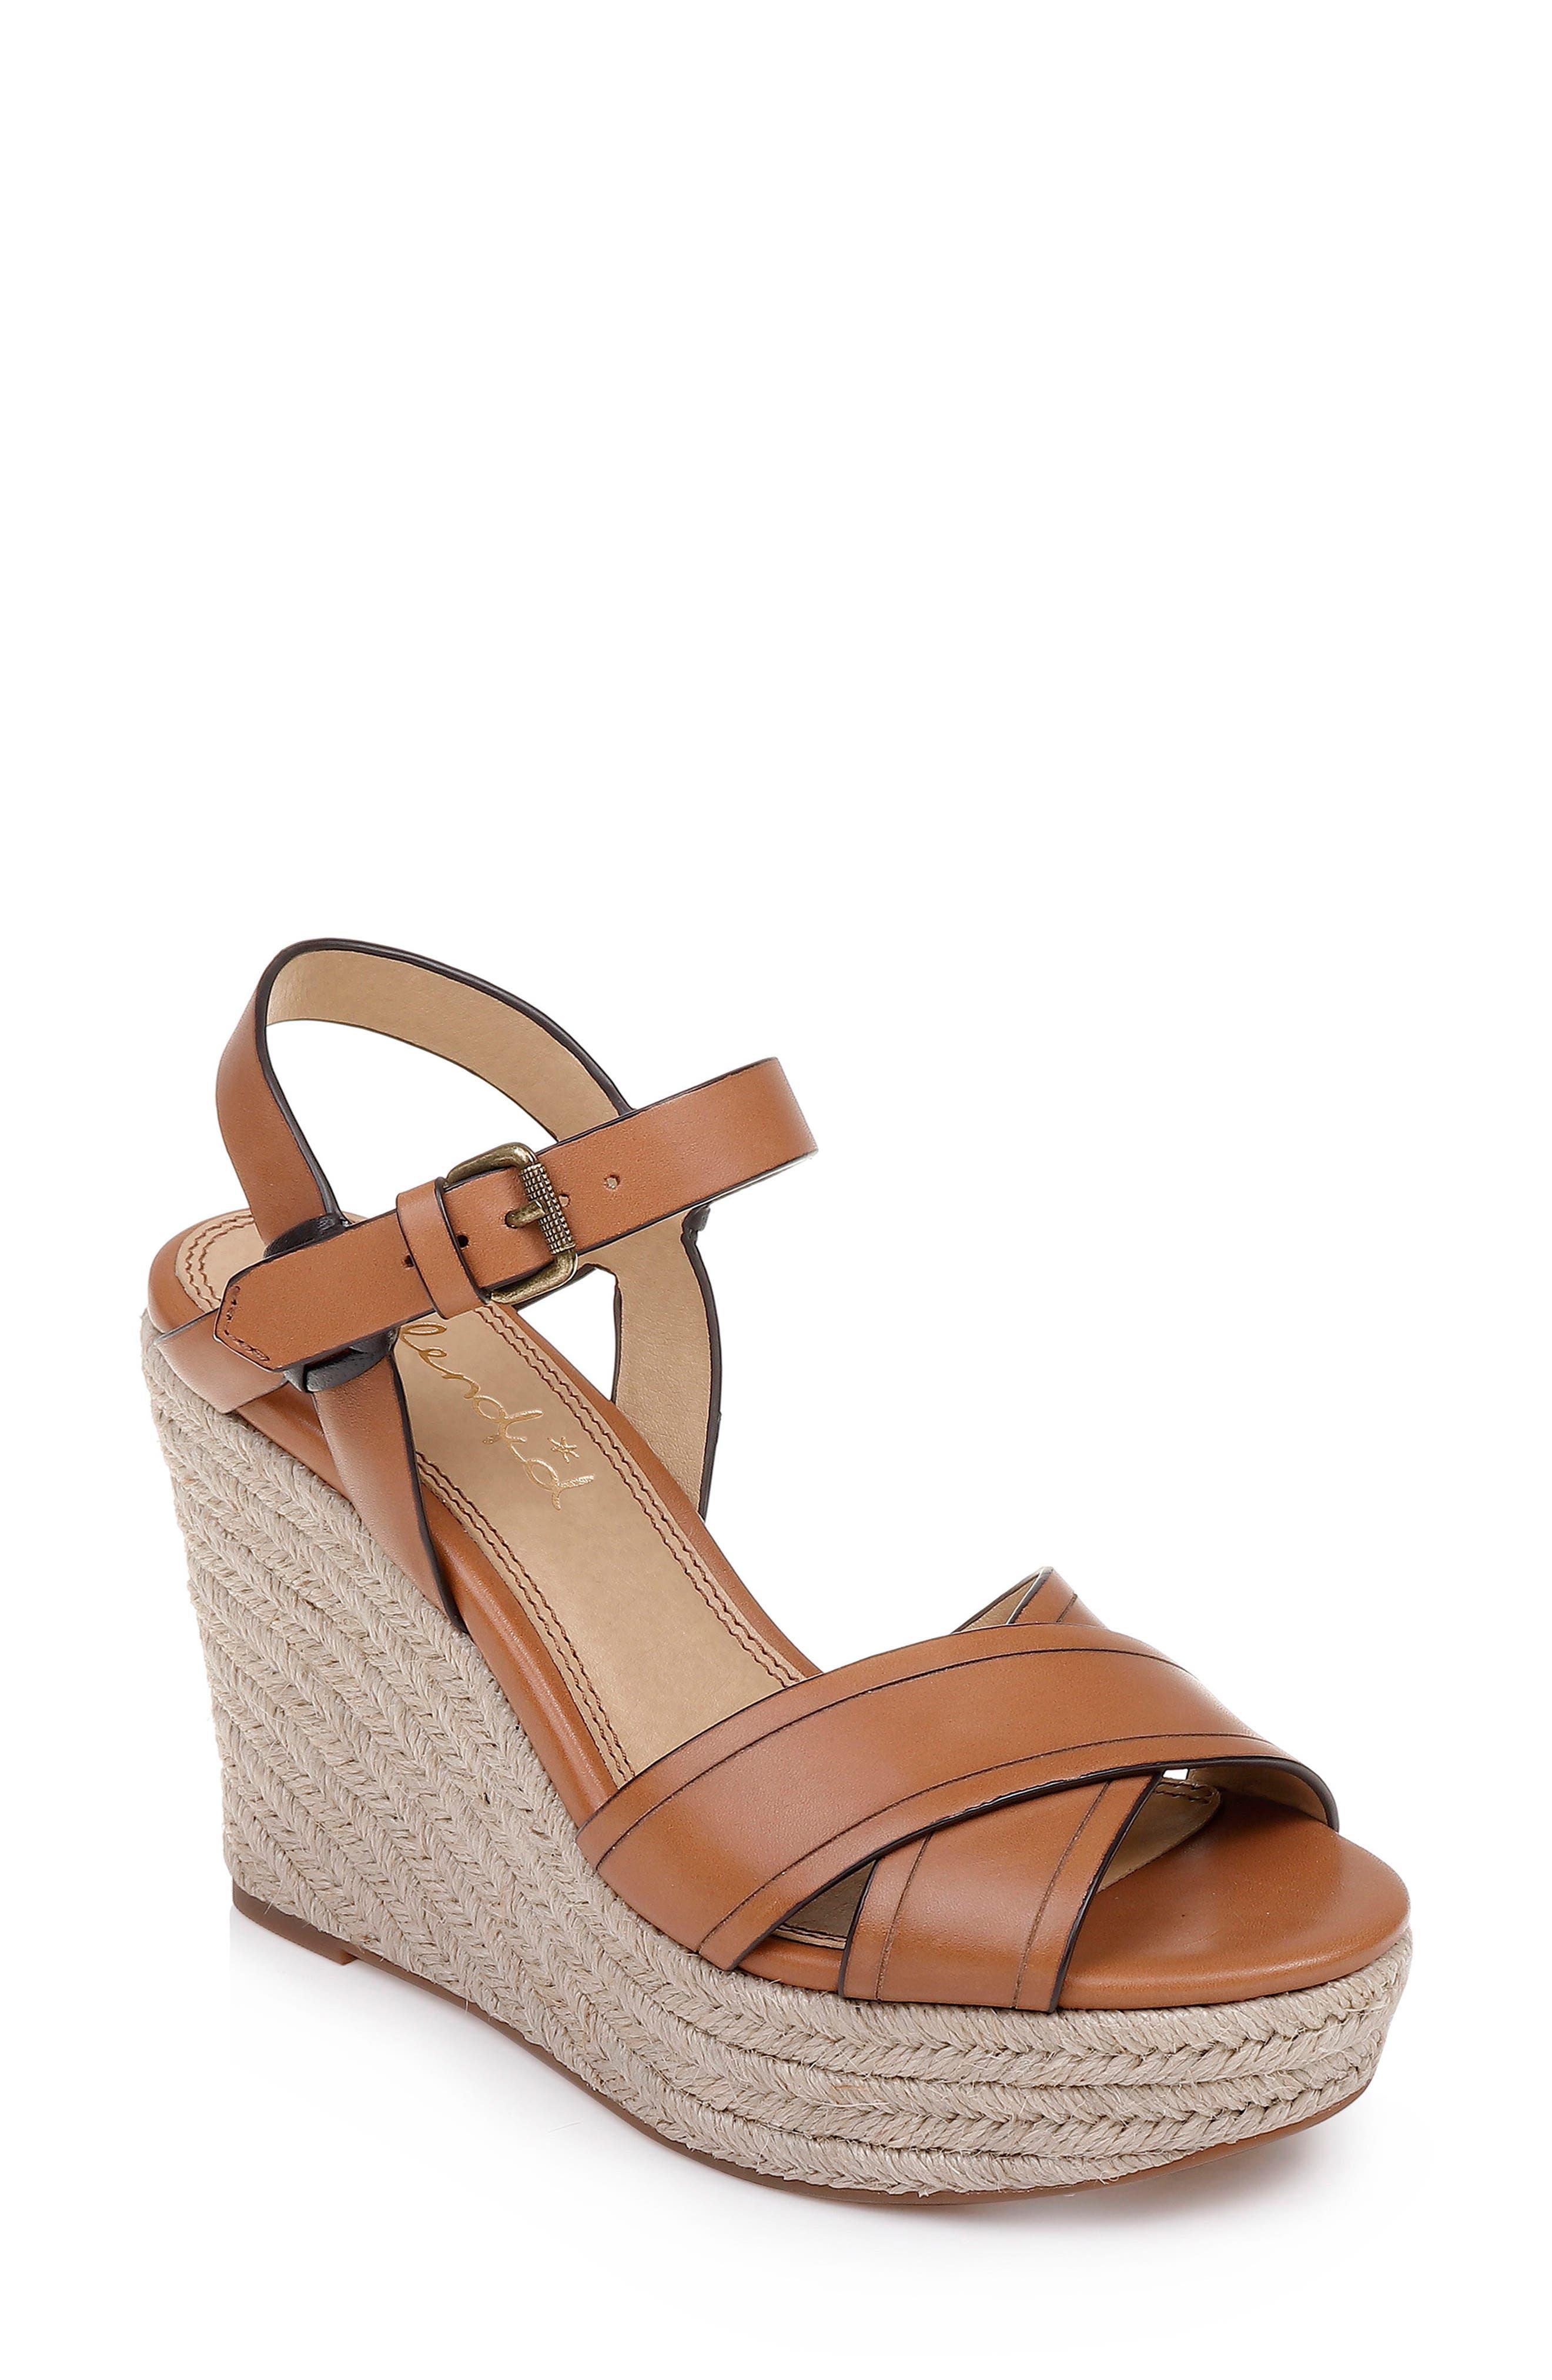 7cb44fc037b Shop Splendid Taffeta Espadrille Wedge Sandal In Brick Leather